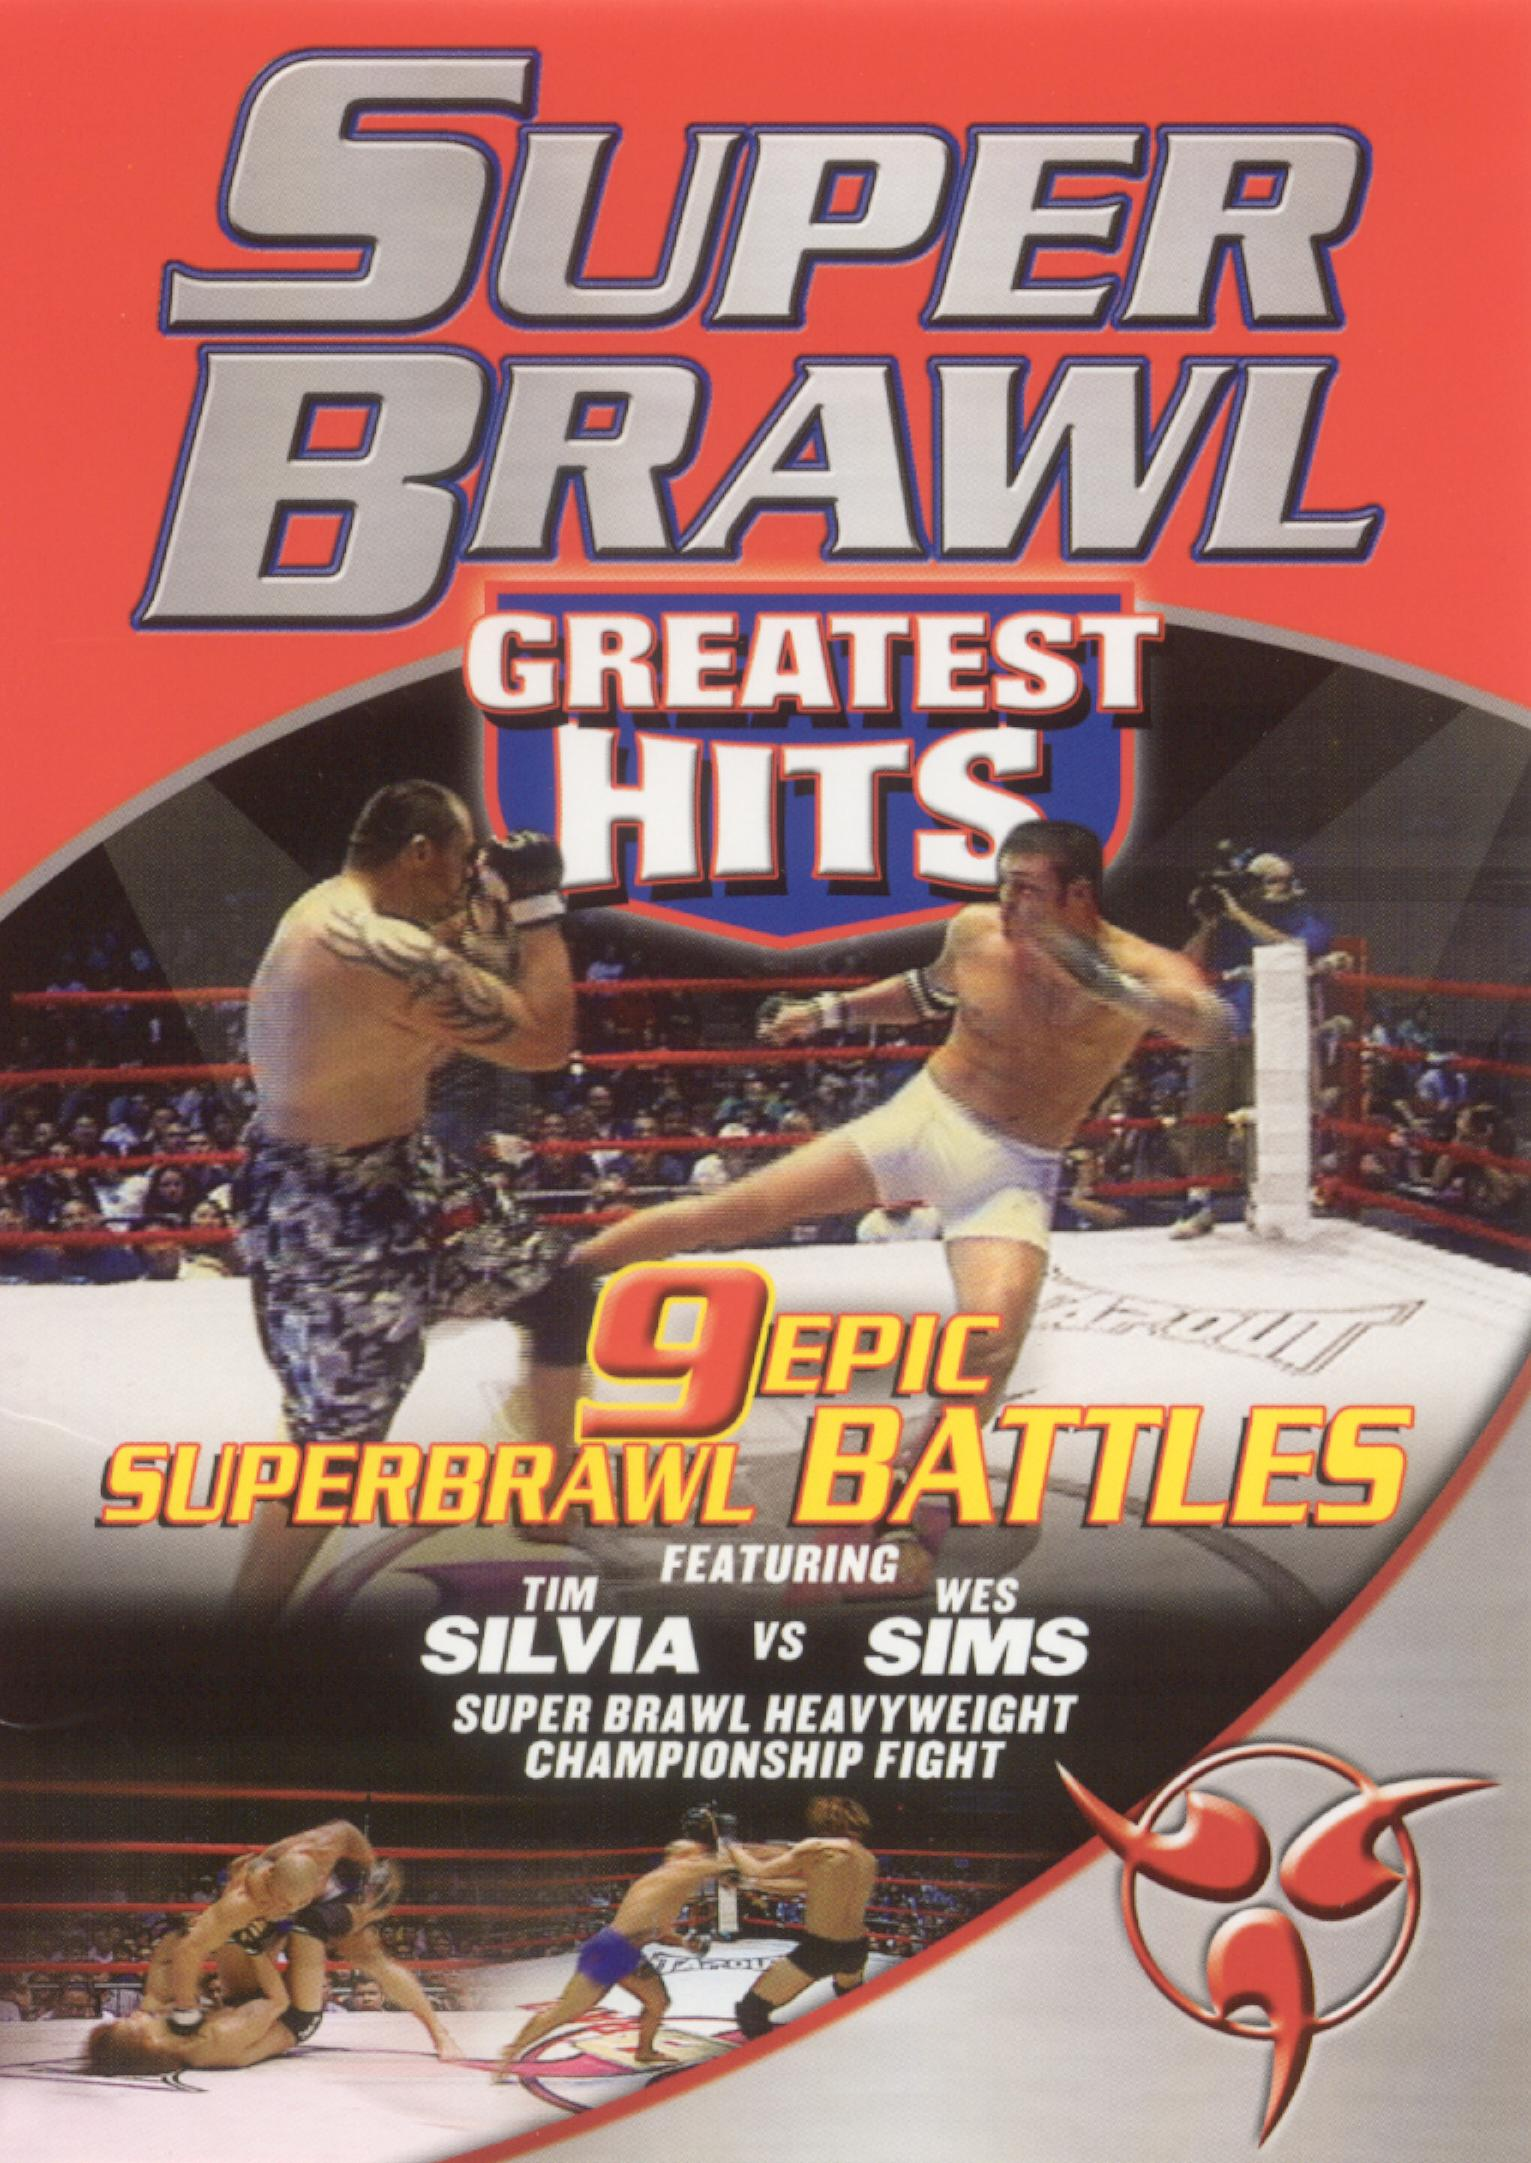 Super Brawl: Greatest Hits